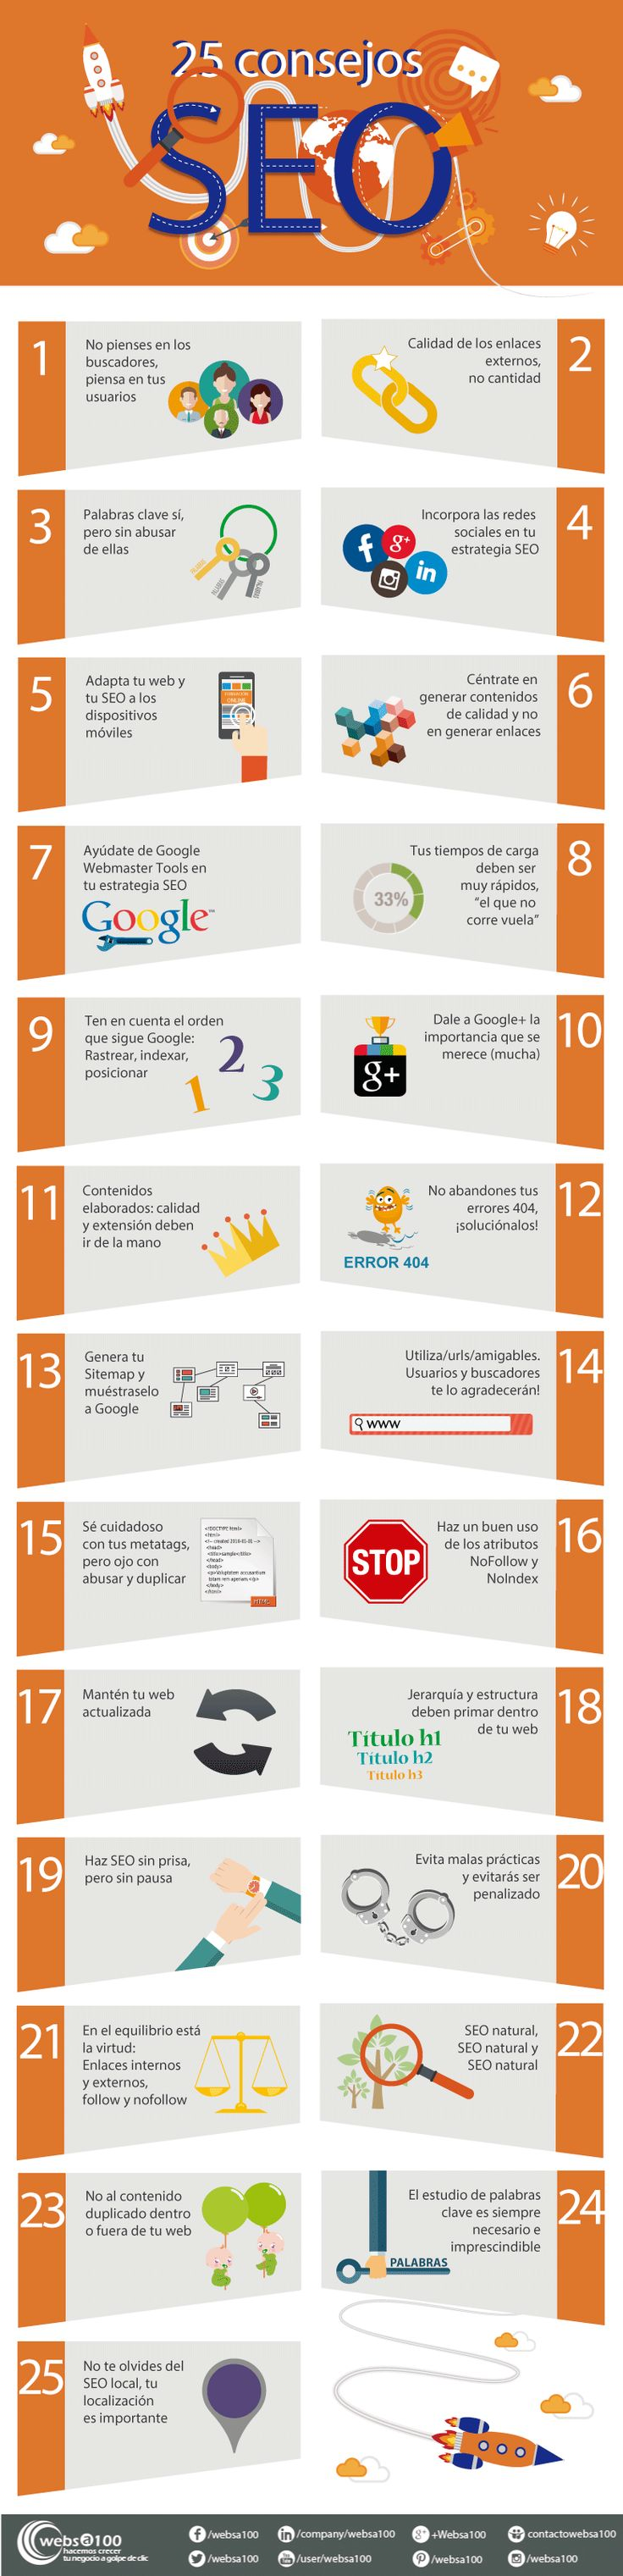 http://www.websa100.com/wp-content/uploads/2015/03/infografia-consejos-SEO.png